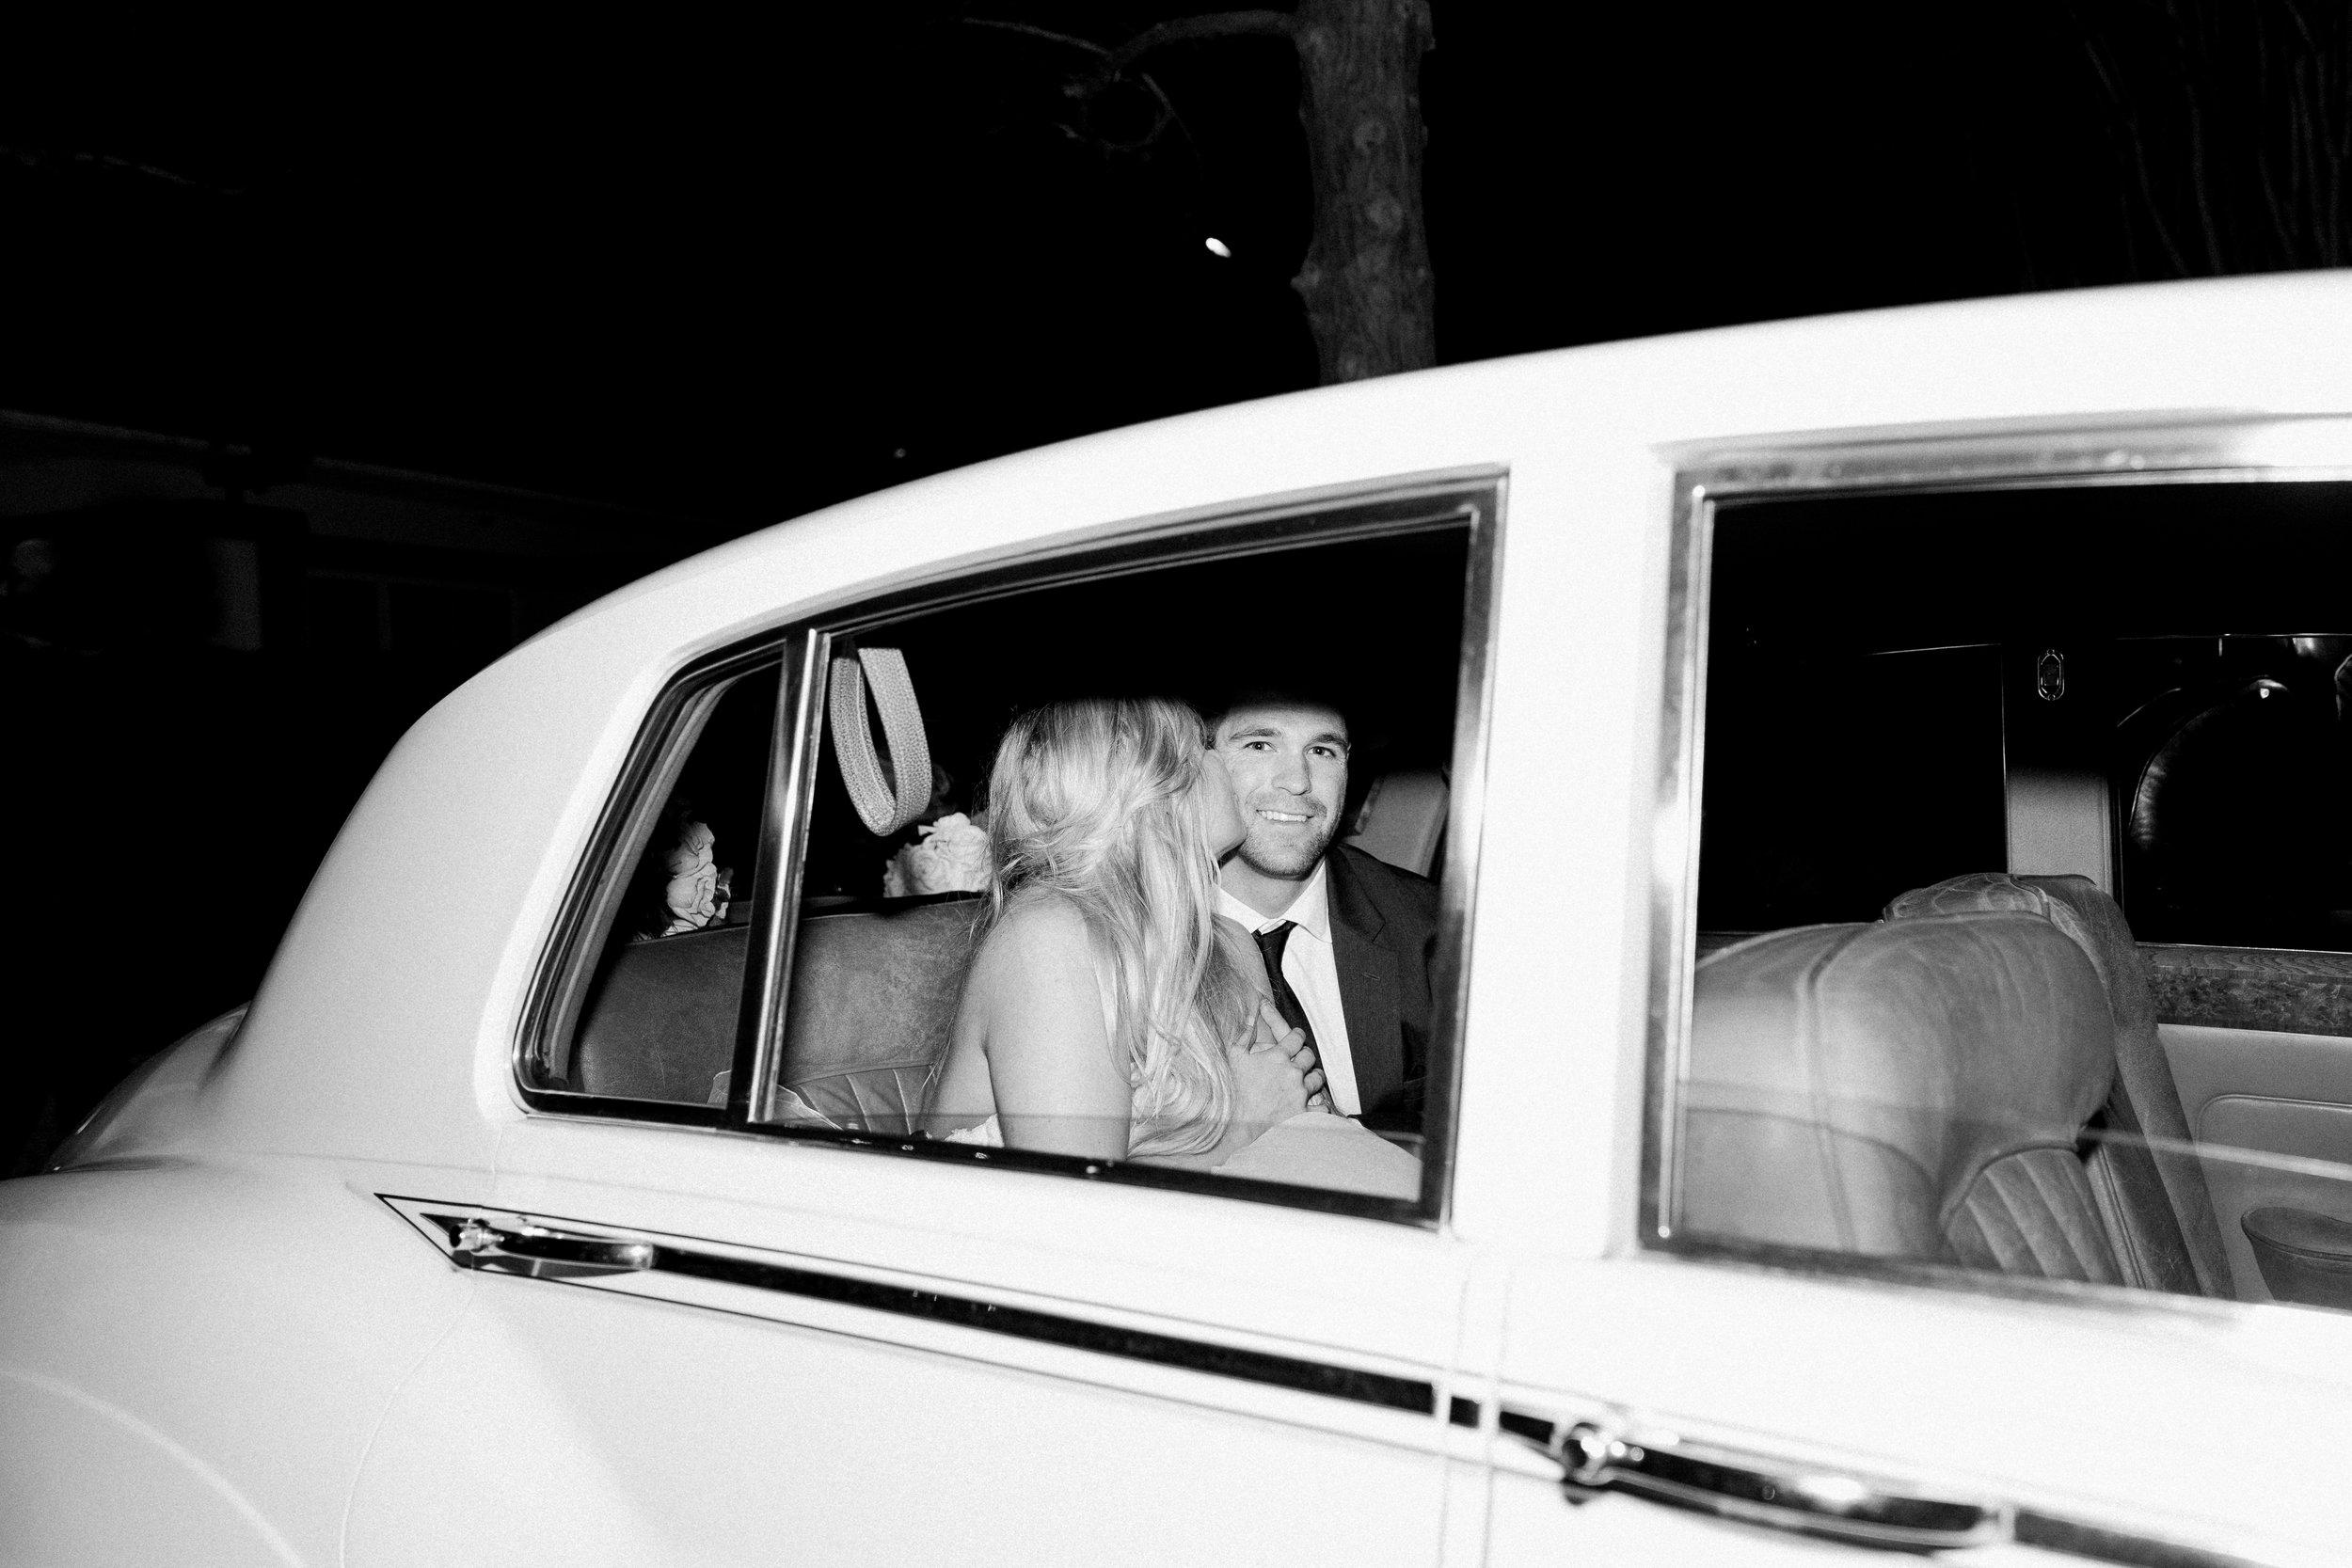 DFW Wedding Planner - Caroline + Jeff at The Four Seasons Hotel Wedding - Allday Events - 215.jpg